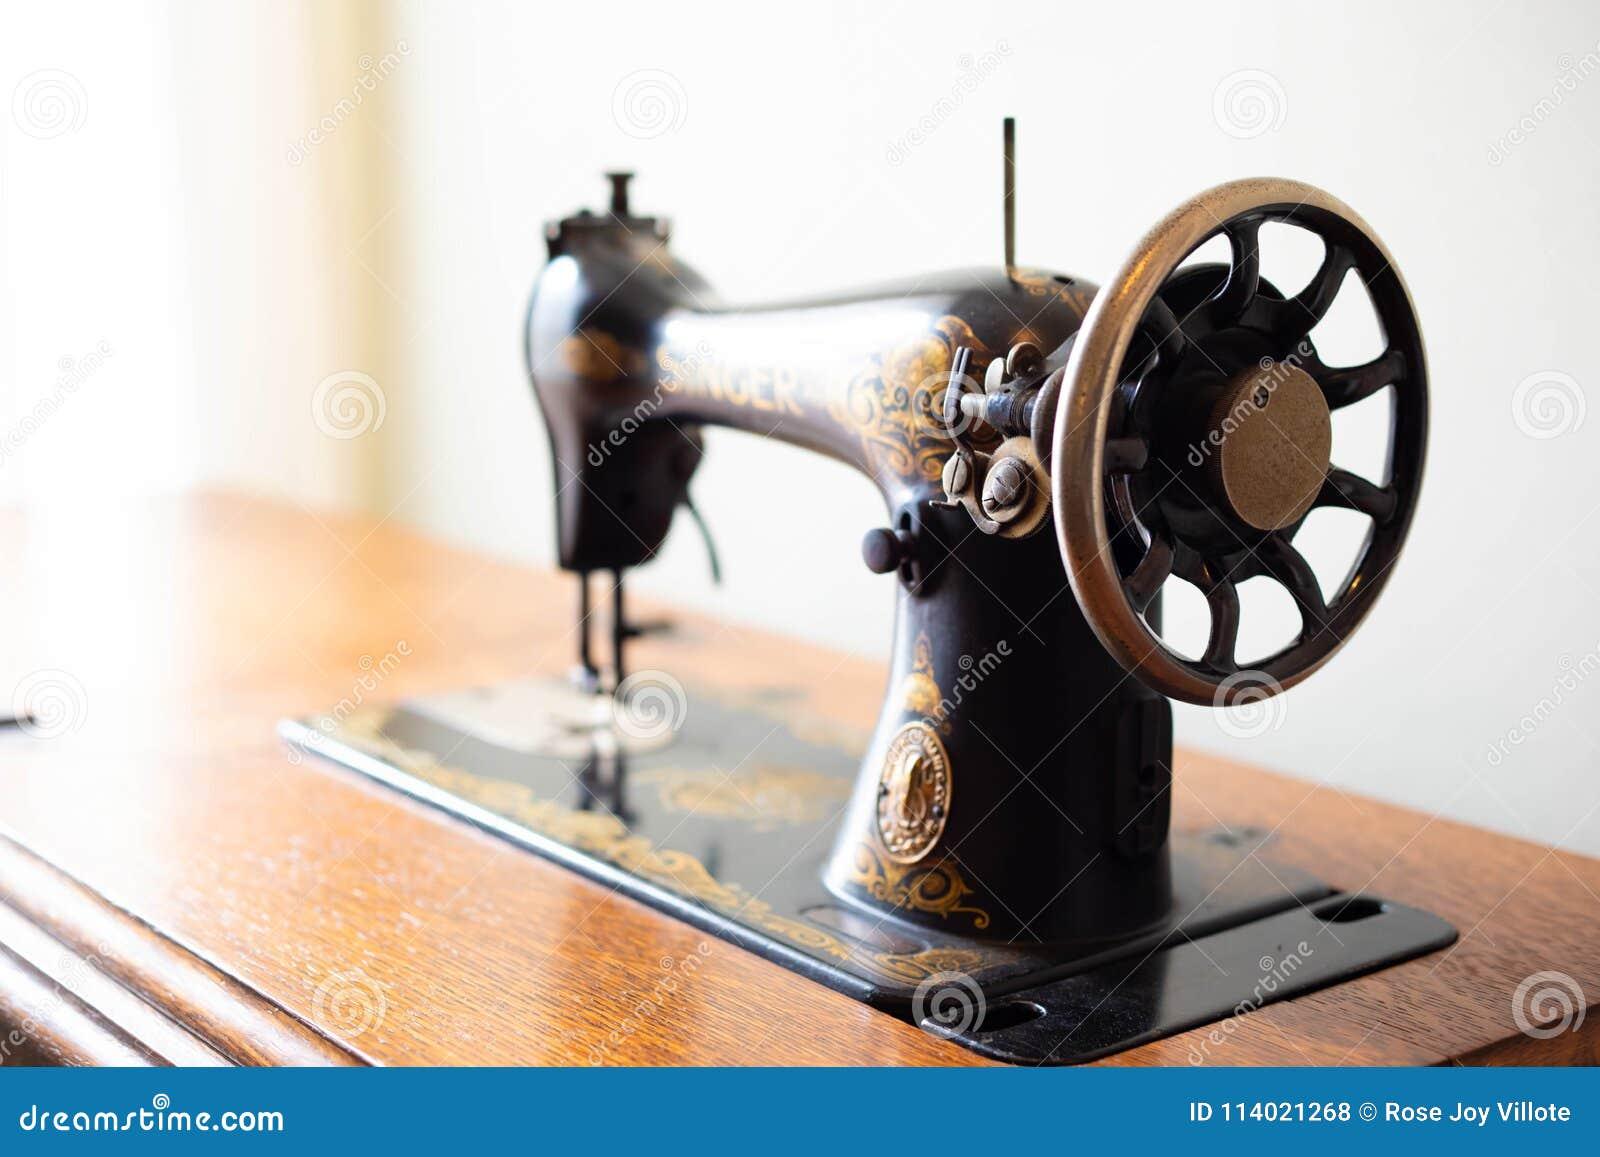 Antique Singer Sewing Machine Editorial Stock Photo - Image